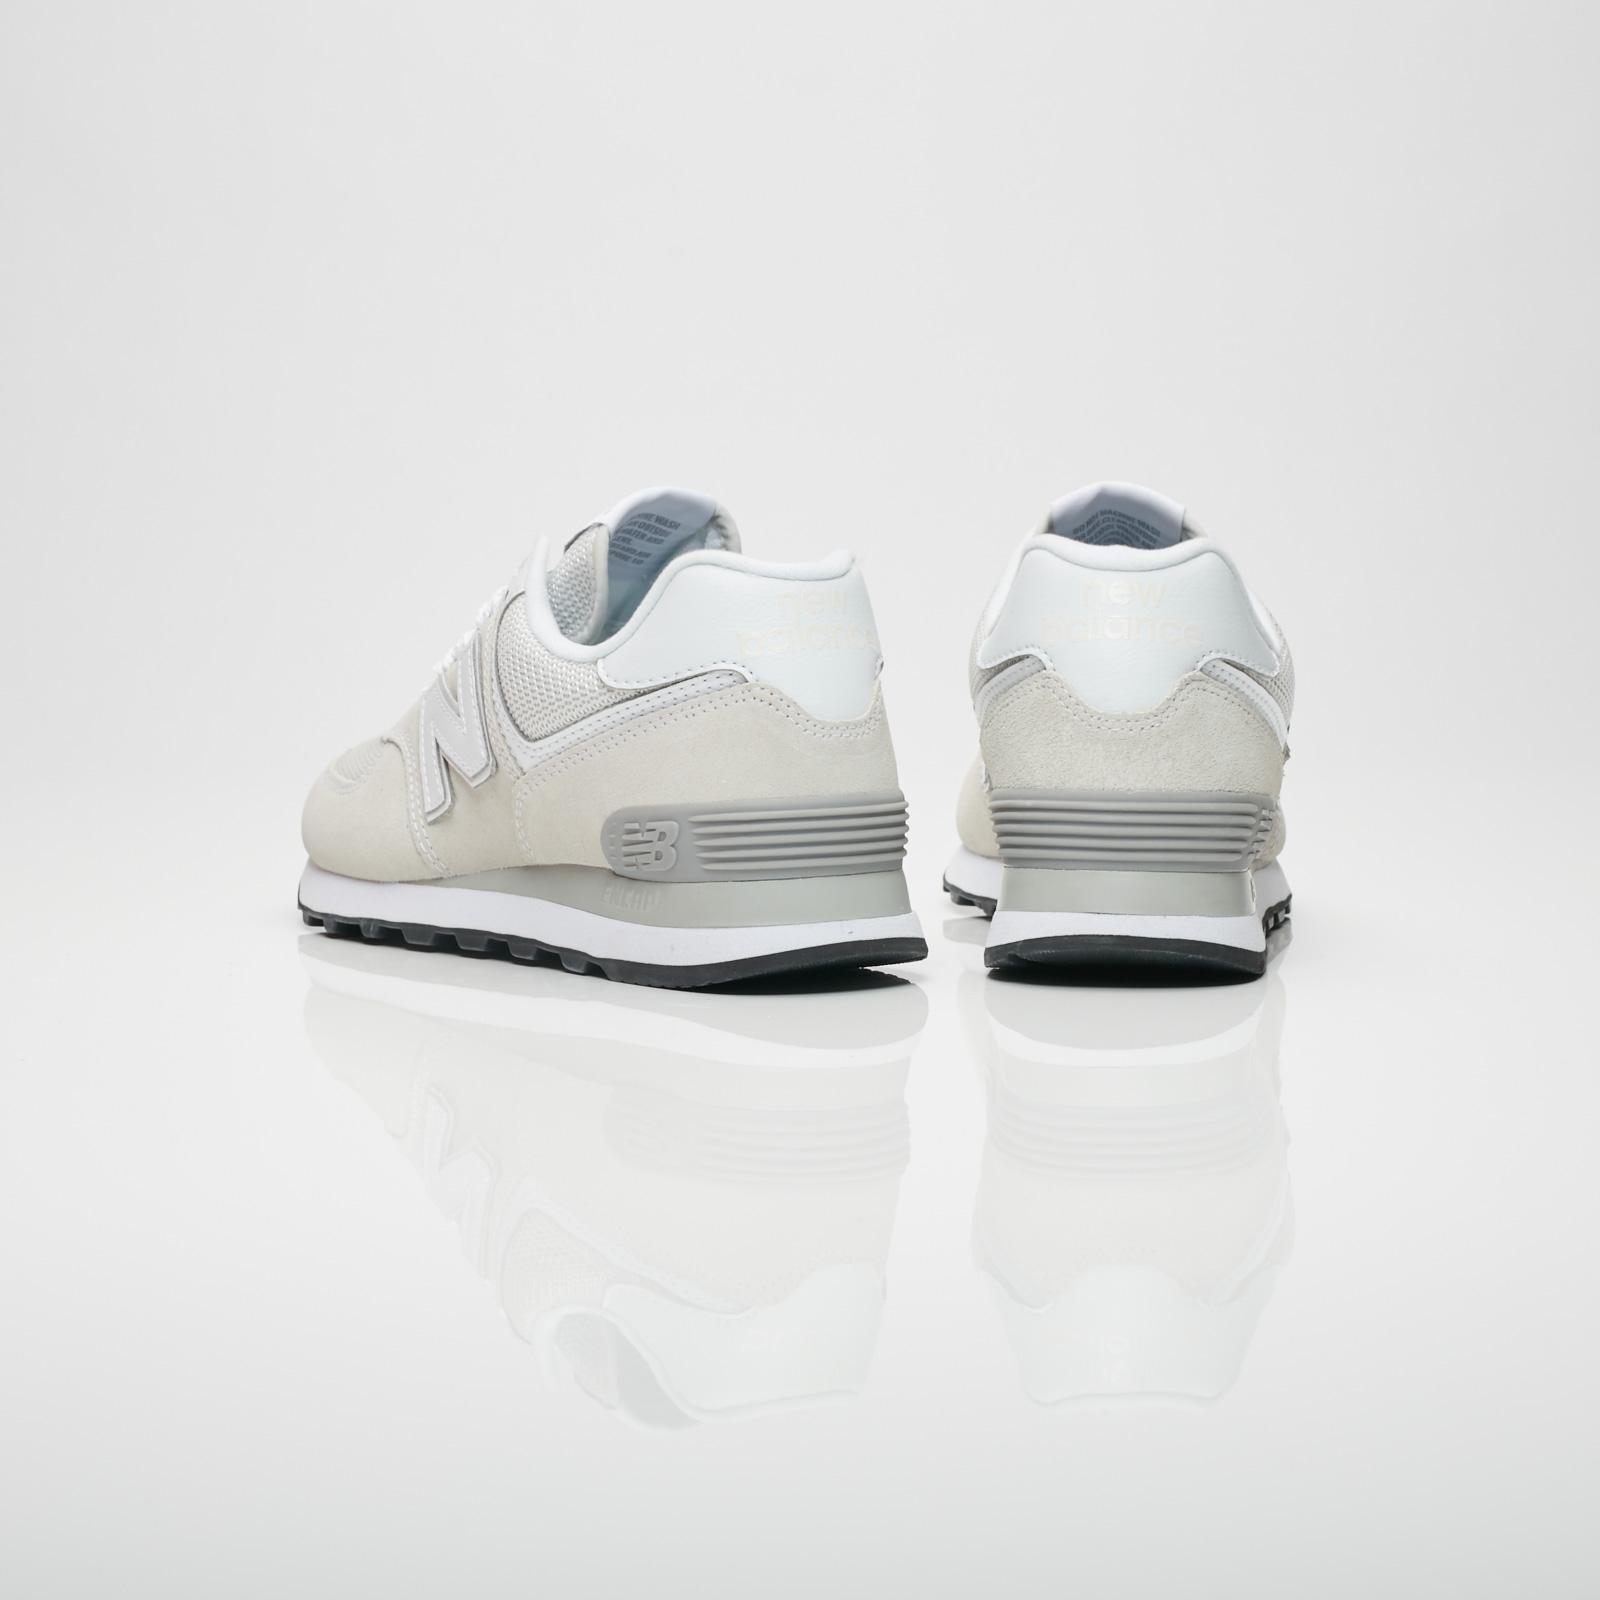 innovative design be4de 42e00 New Balance WL574 - Wl574ew - Sneakersnstuff | sneakers ...